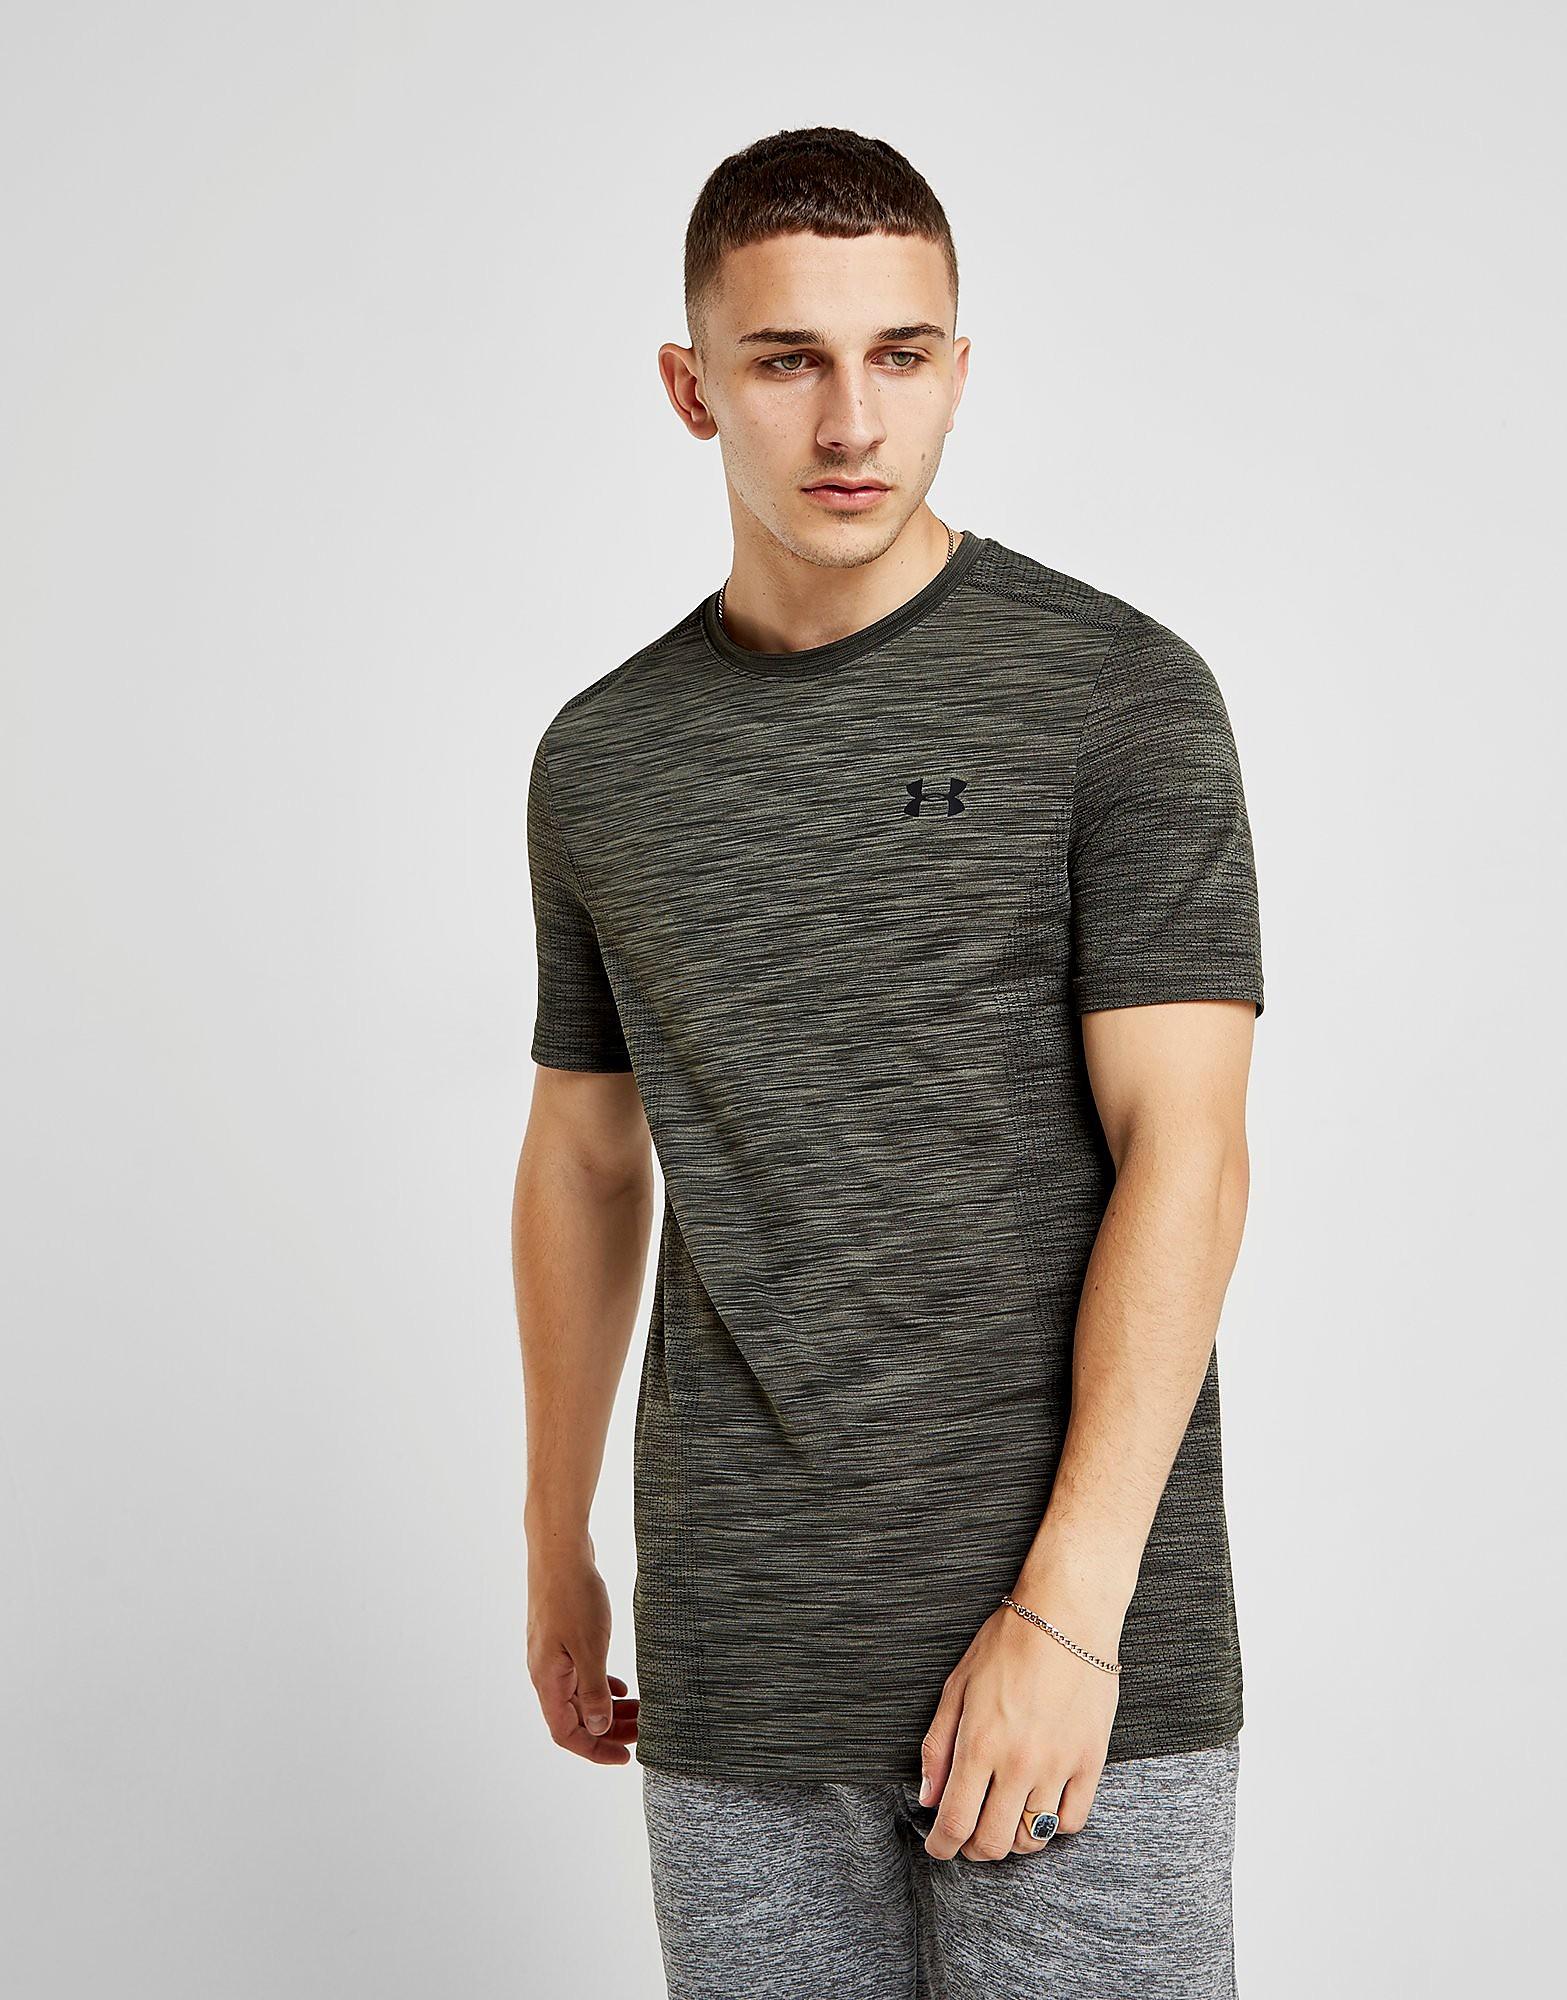 Under Armour camiseta Threadborne Seamless